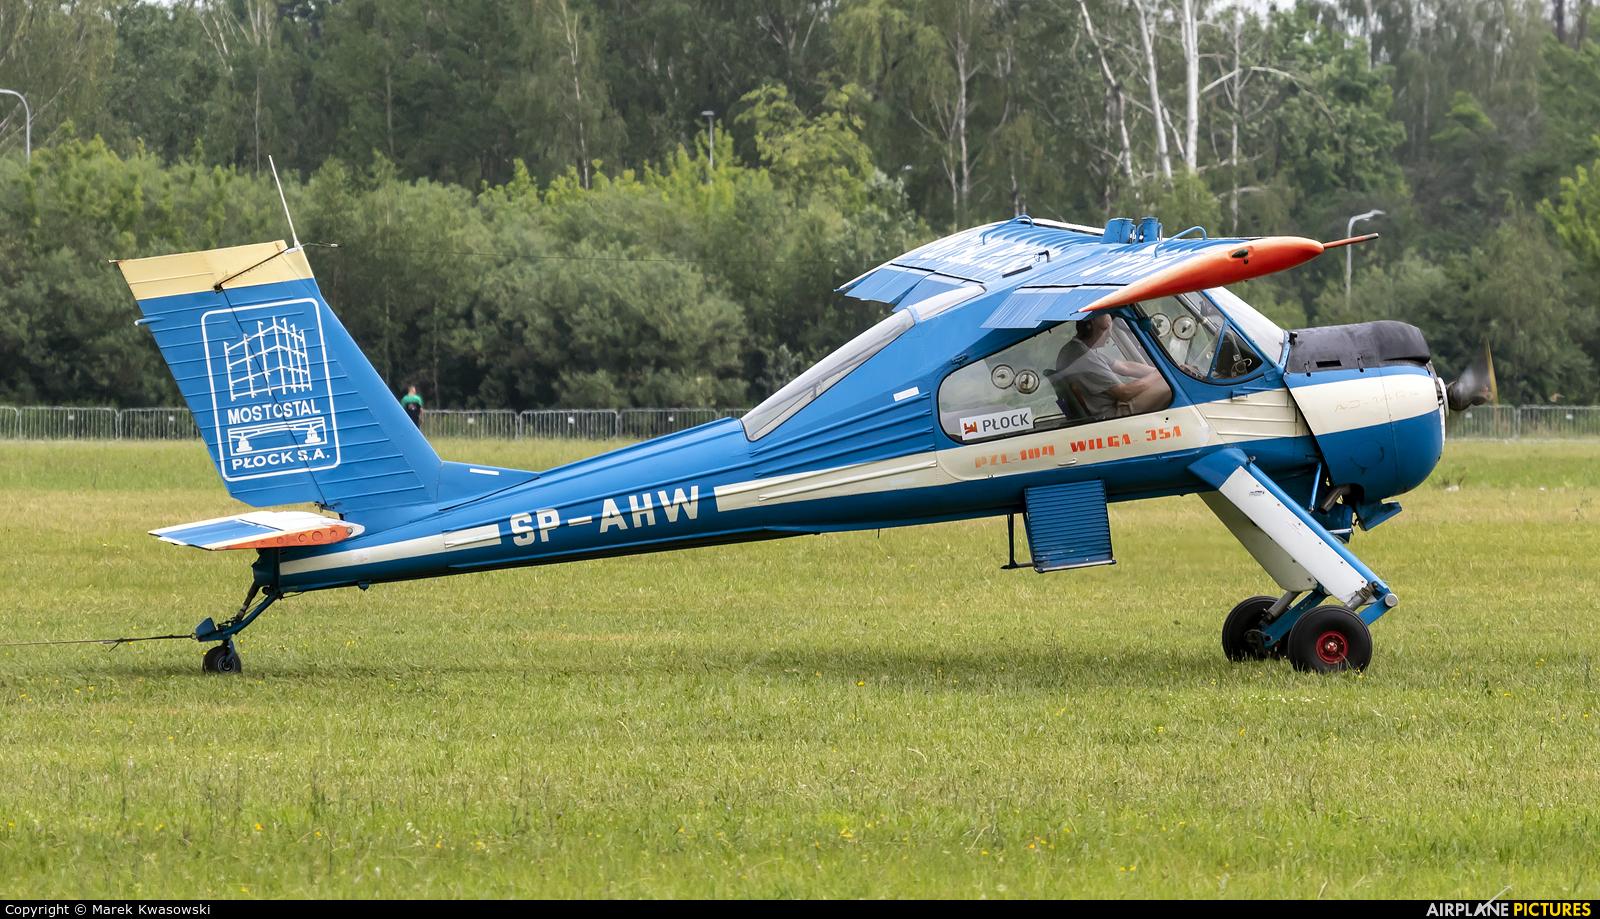 Aeroklub Ziemi Mazowieckiej SP-AHW aircraft at Płock